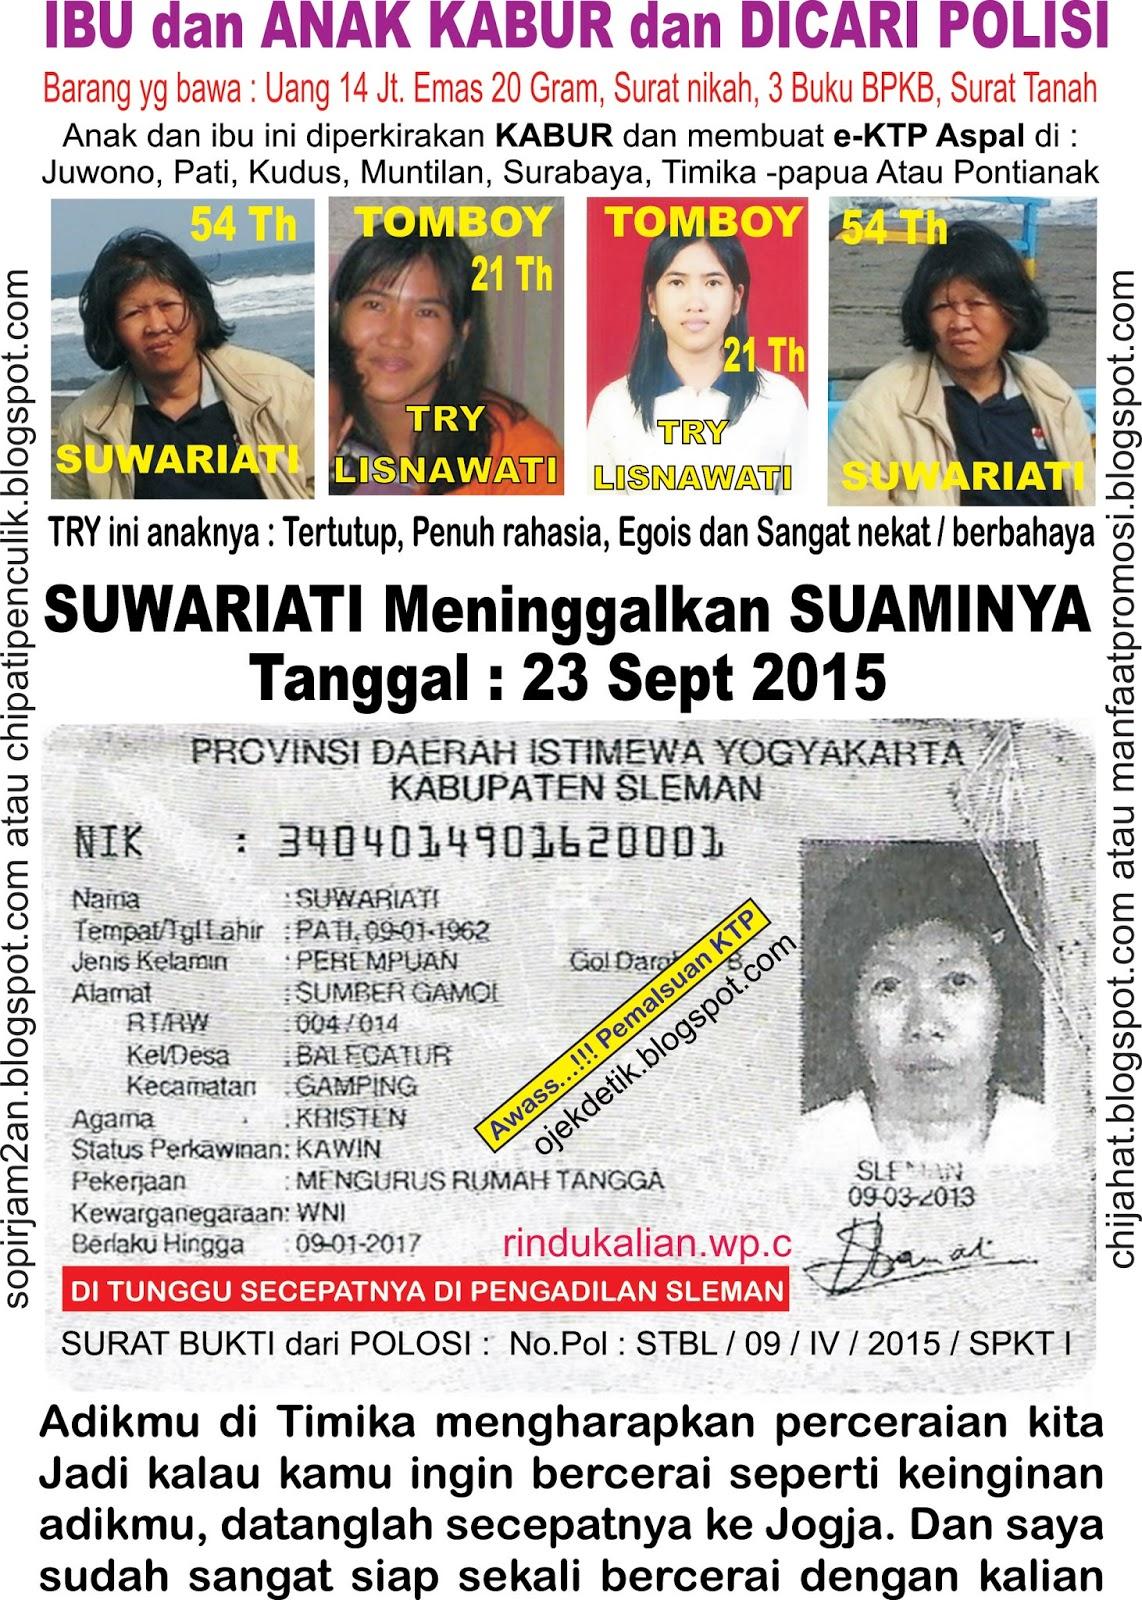 Image Result For Agen Pulsa Murah Bandung Cimahi